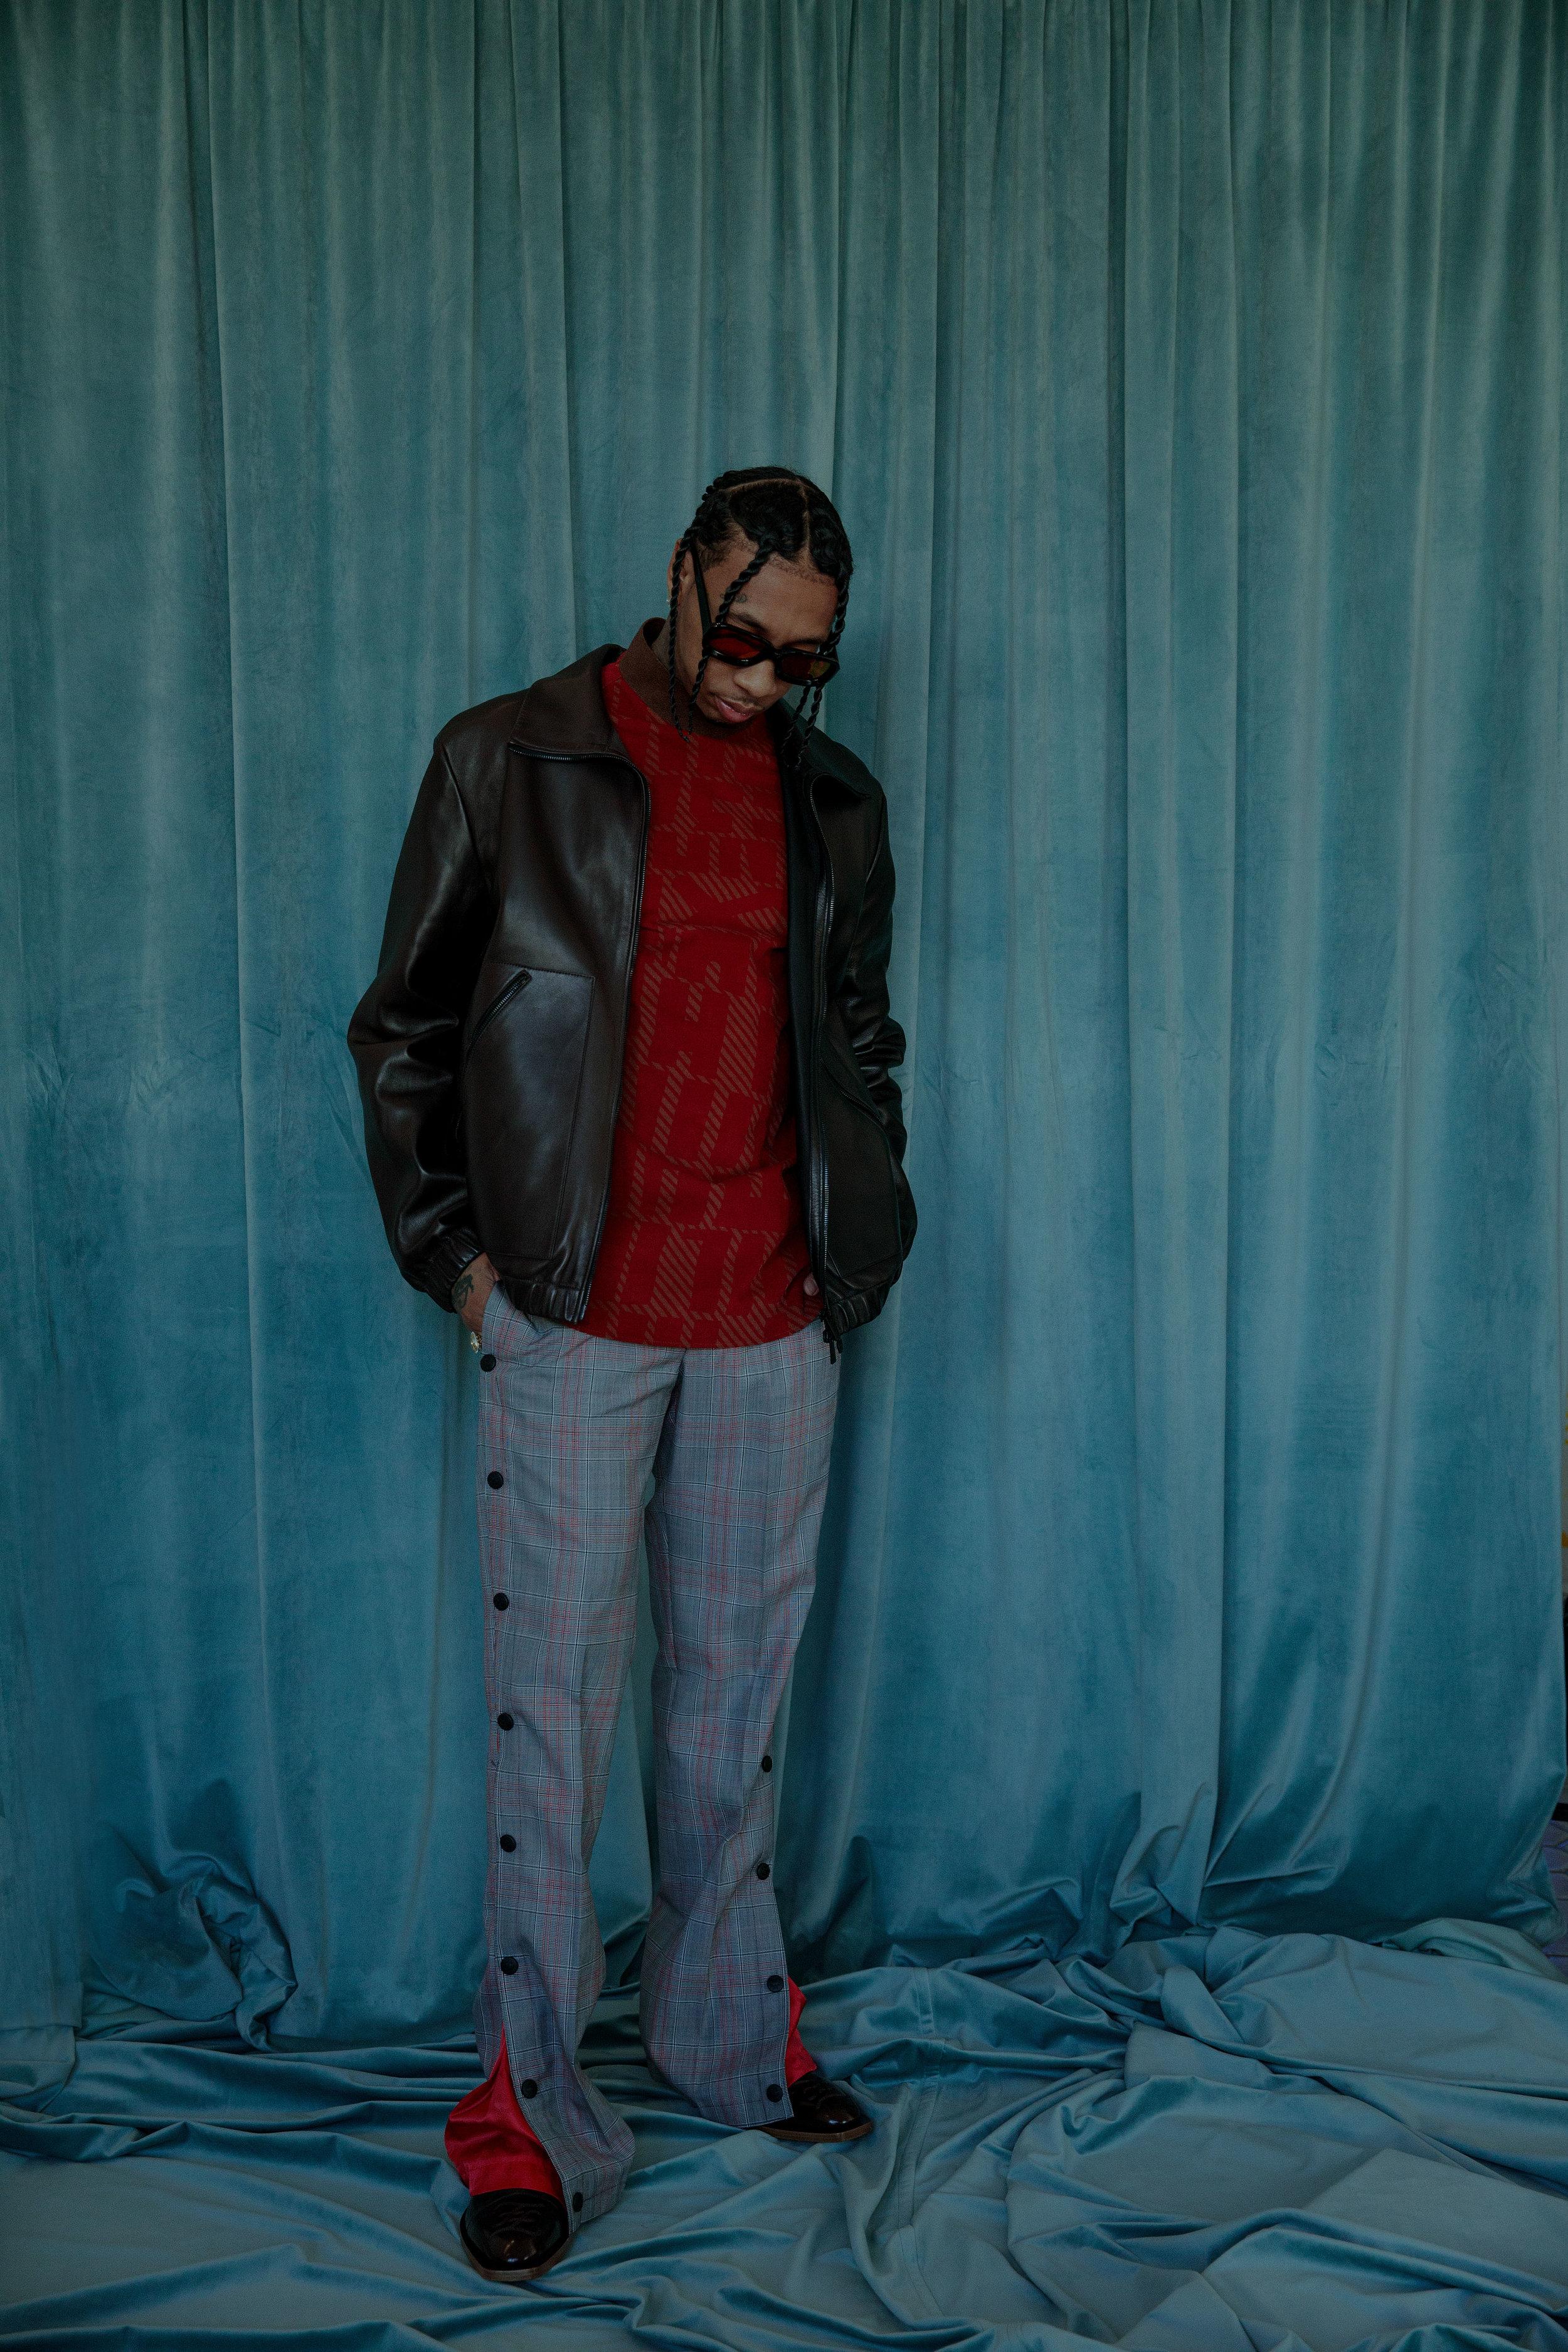 FENDI   jacket and boots,   ERMENEGILDO ZEGNA XXX   sweater,   MCM   pants, and   FAIRFAX OPTICAL LAB   sunglasses.